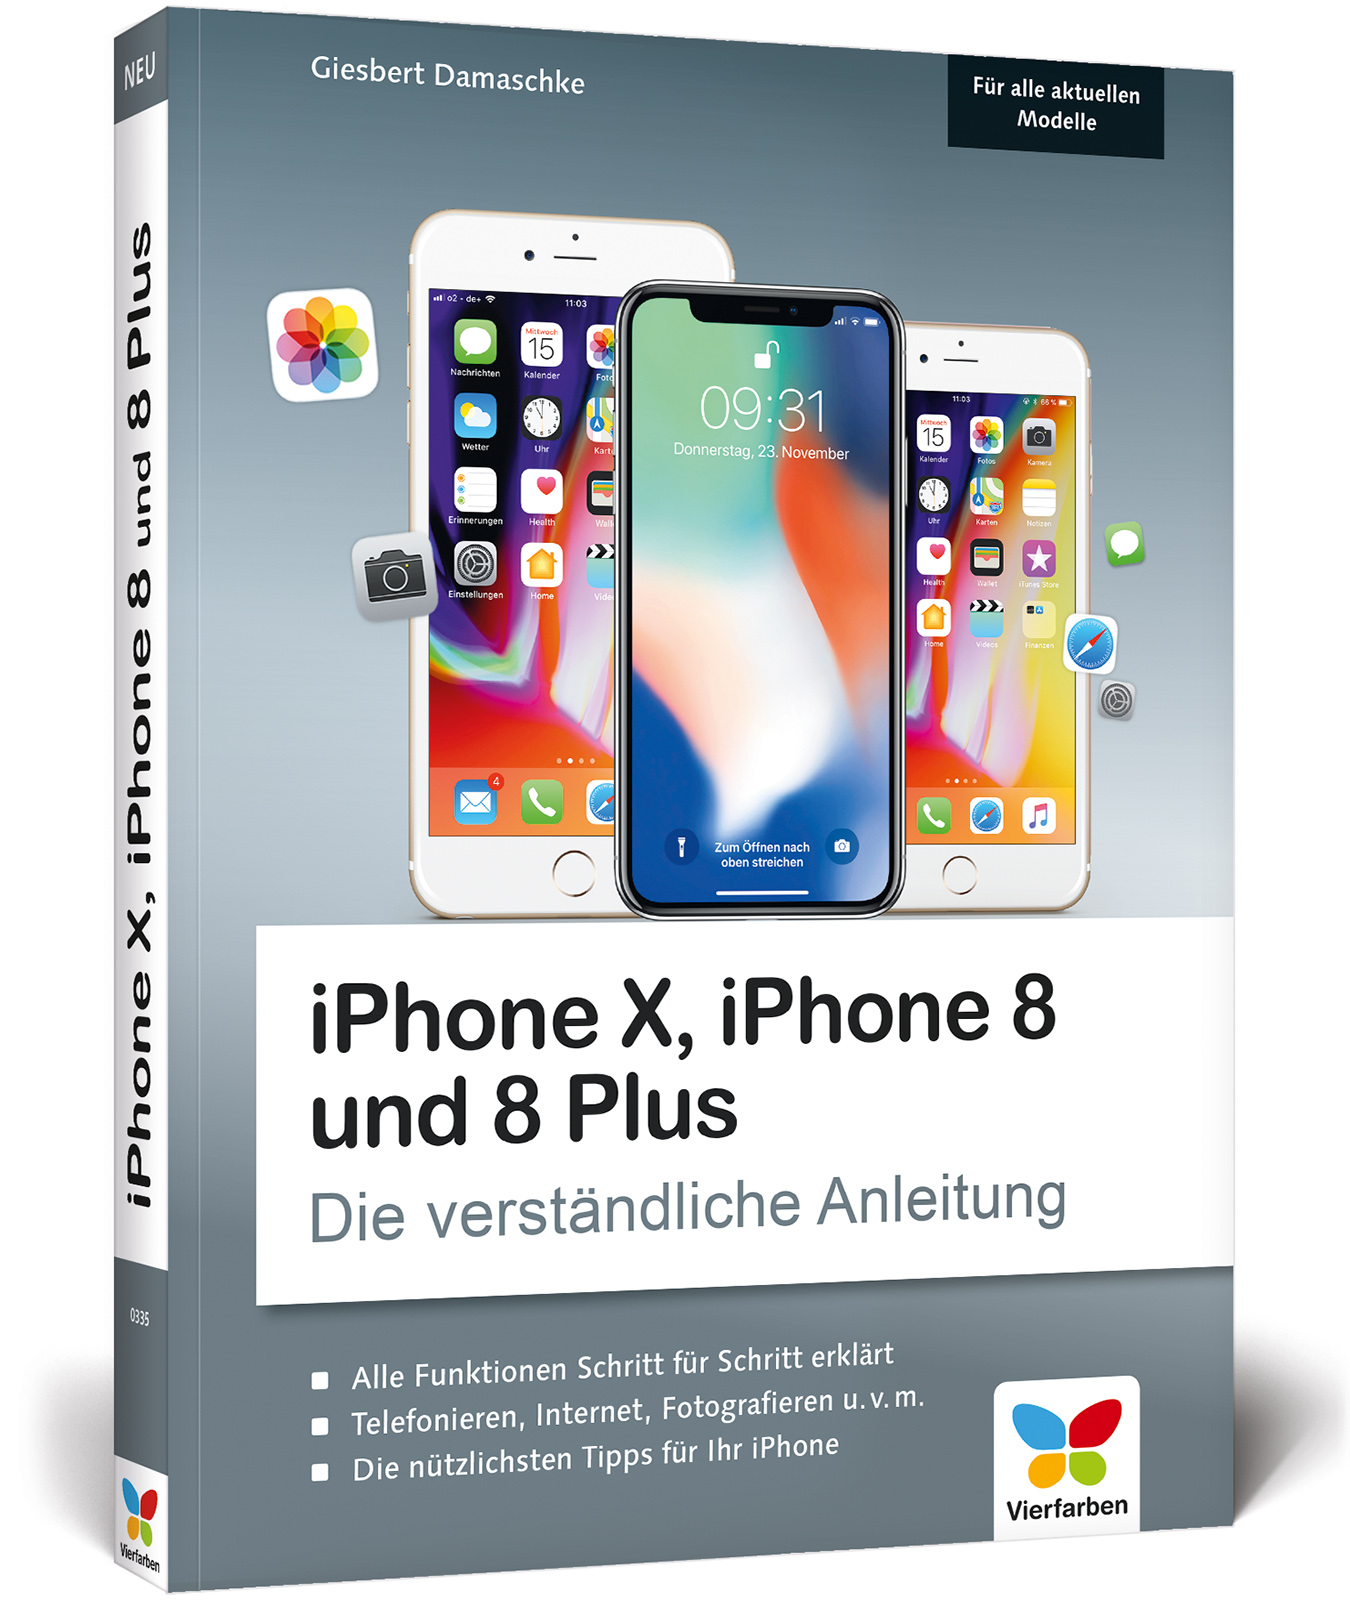 iPhone-X-iPhone-8-und-8-Plus-Giesbert-Damaschke